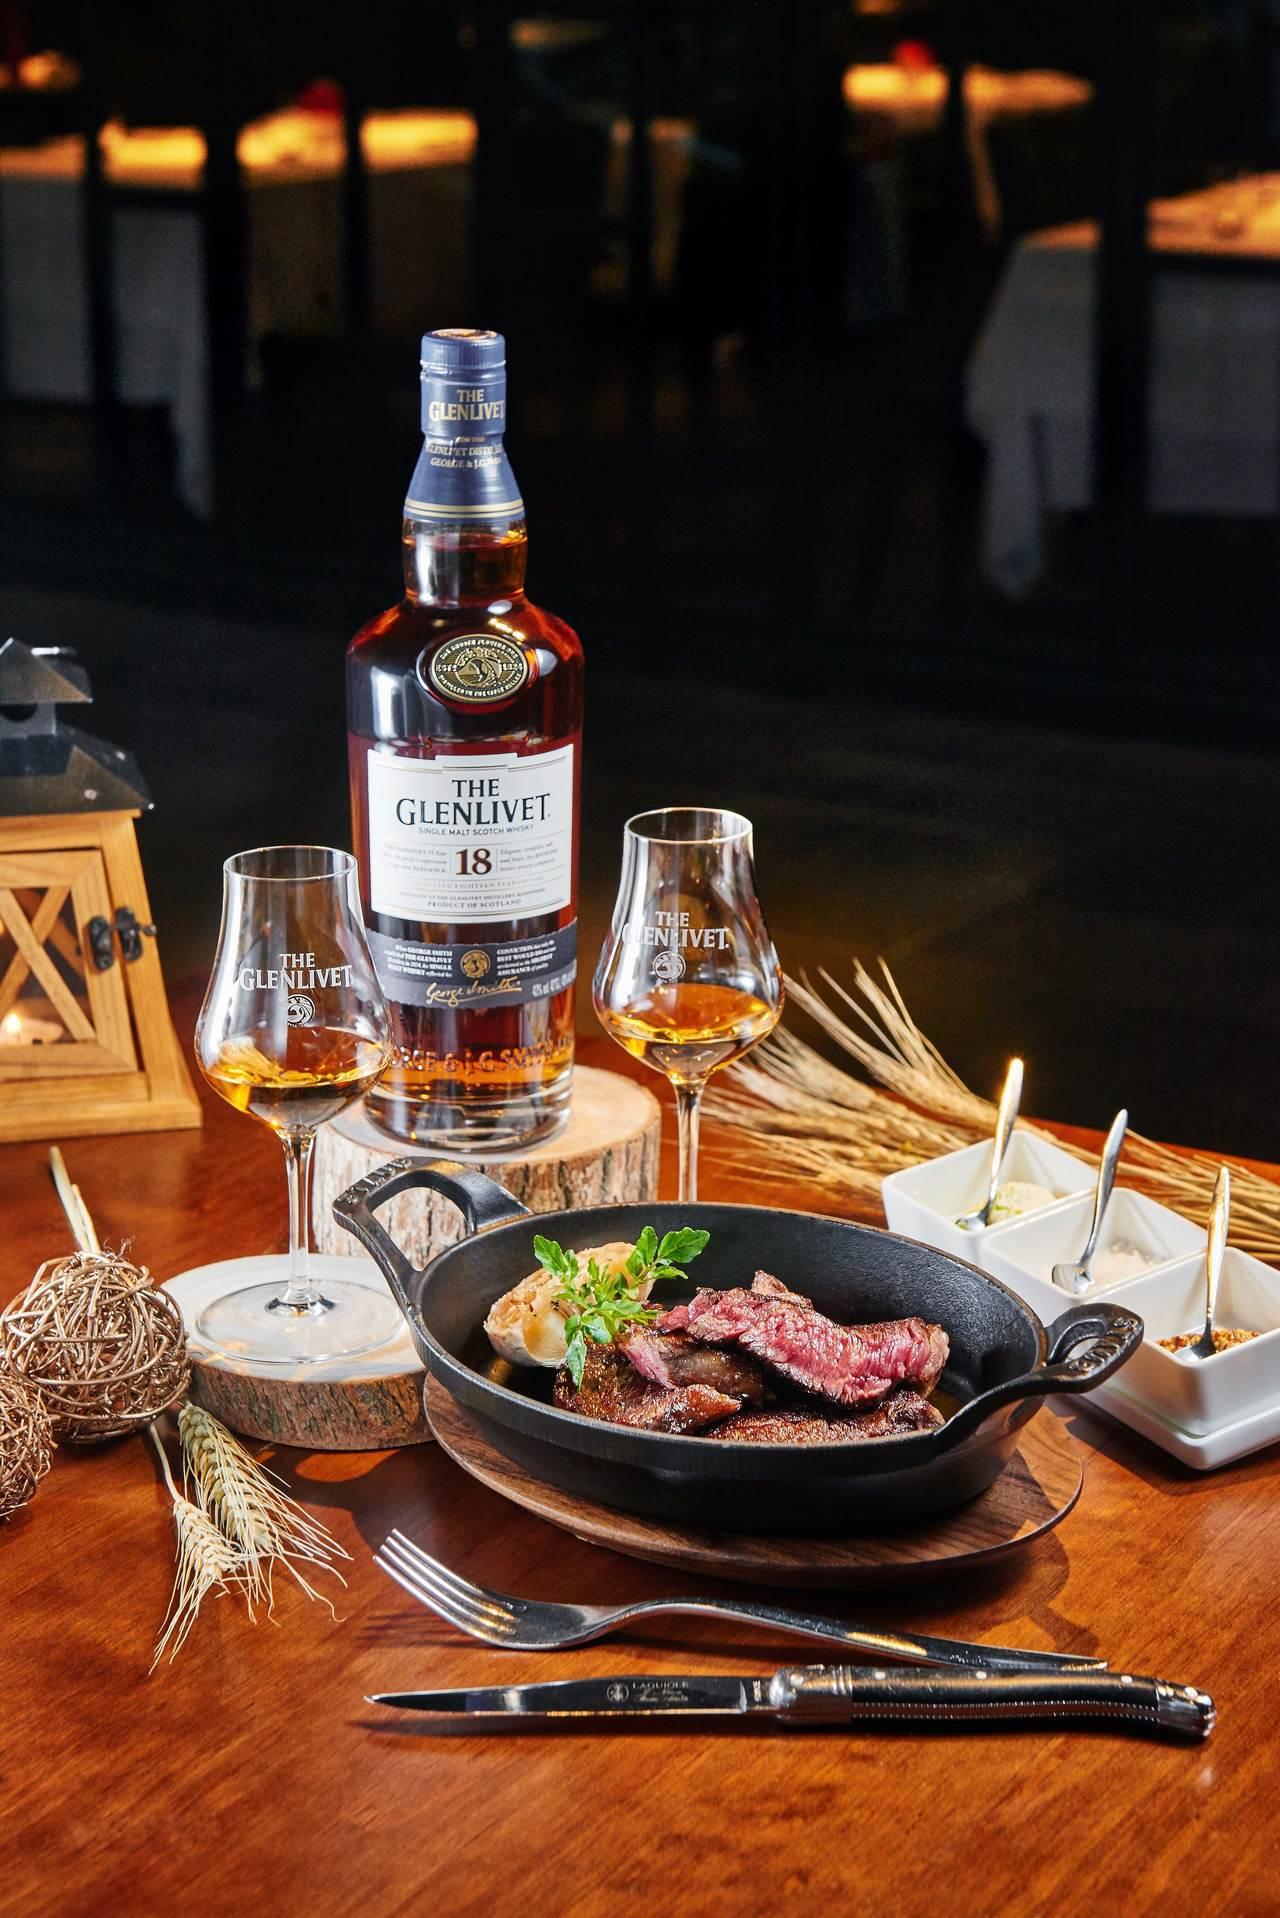 THE GLENLIVET格蘭利威18年單一麥芽威士忌客製化套餐。圖/台灣保樂力...